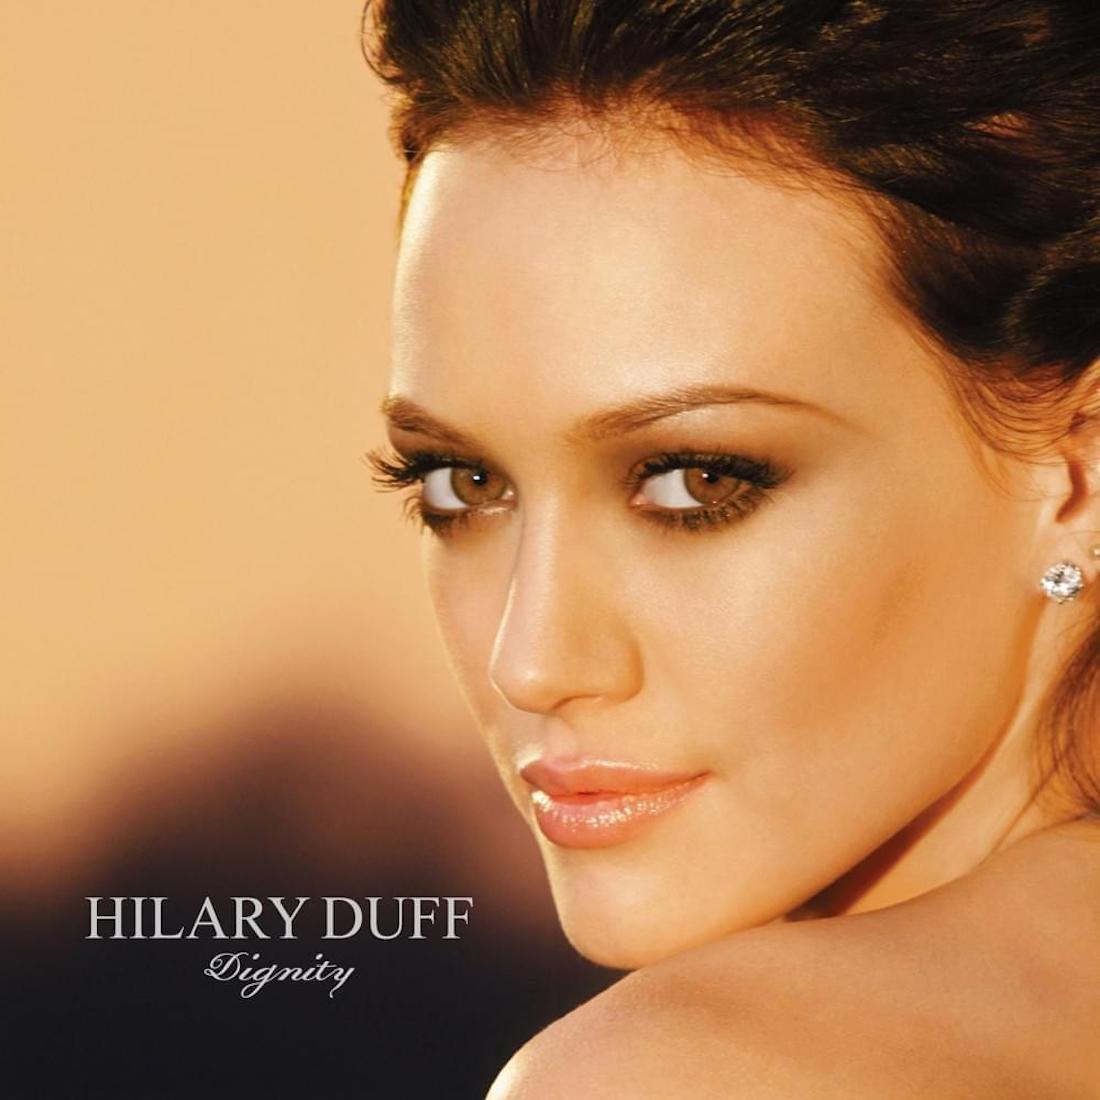 Hilary Duff - Dignity (2007) album cover